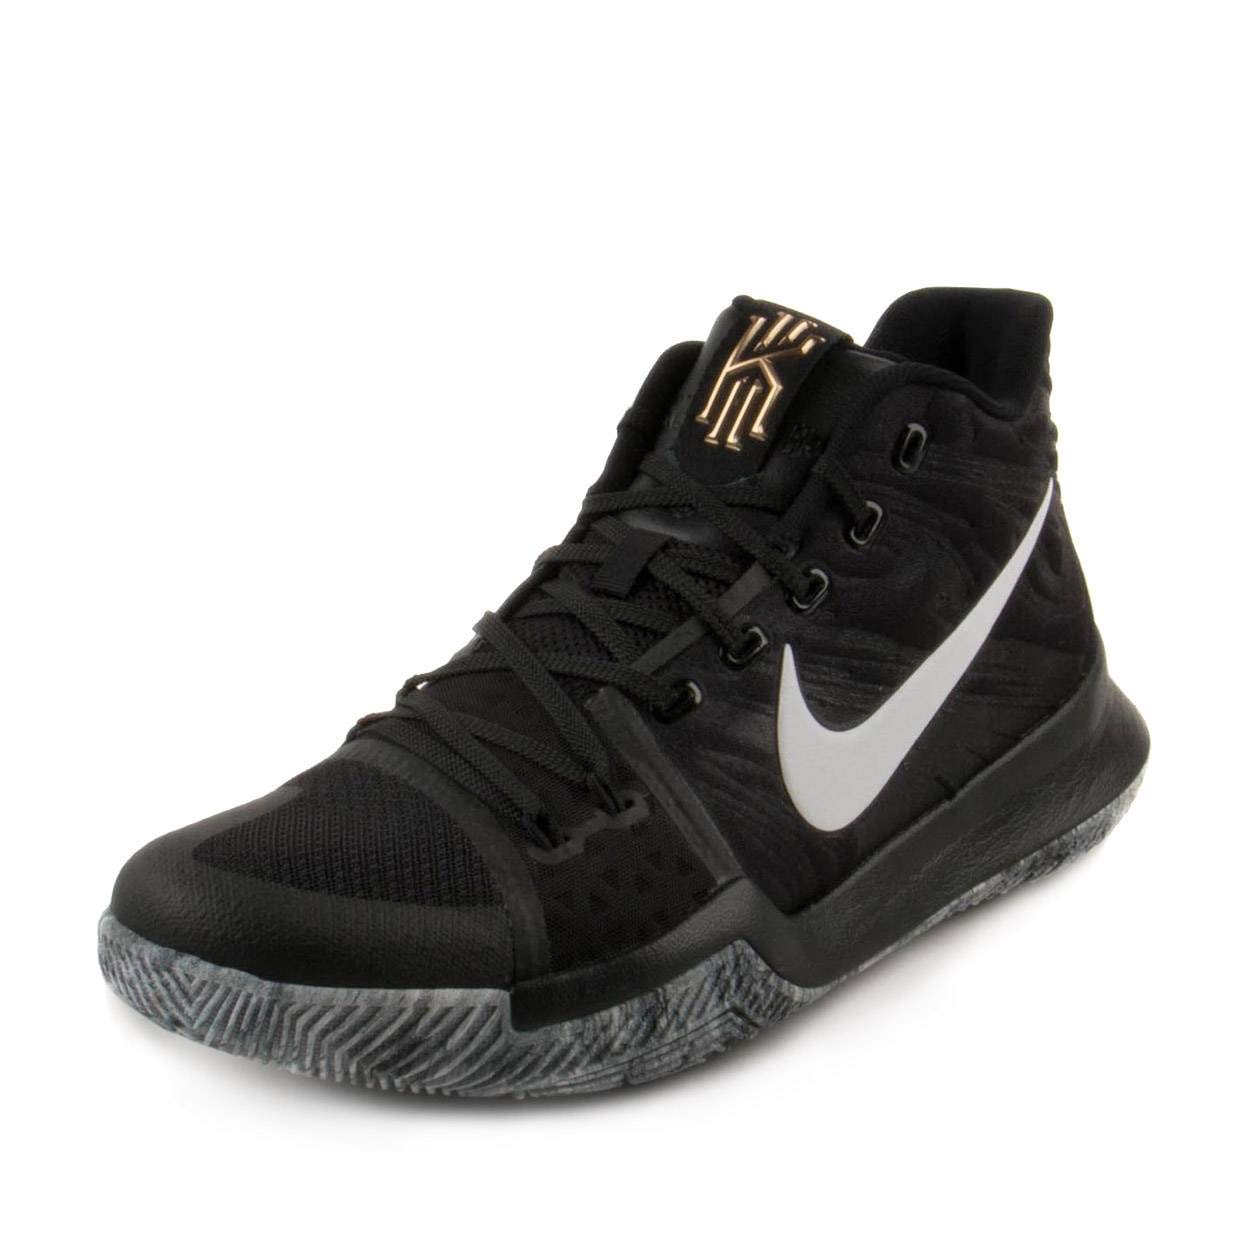 Nike Mens Kyrie 3 BHM Black/White Mesh Size 10